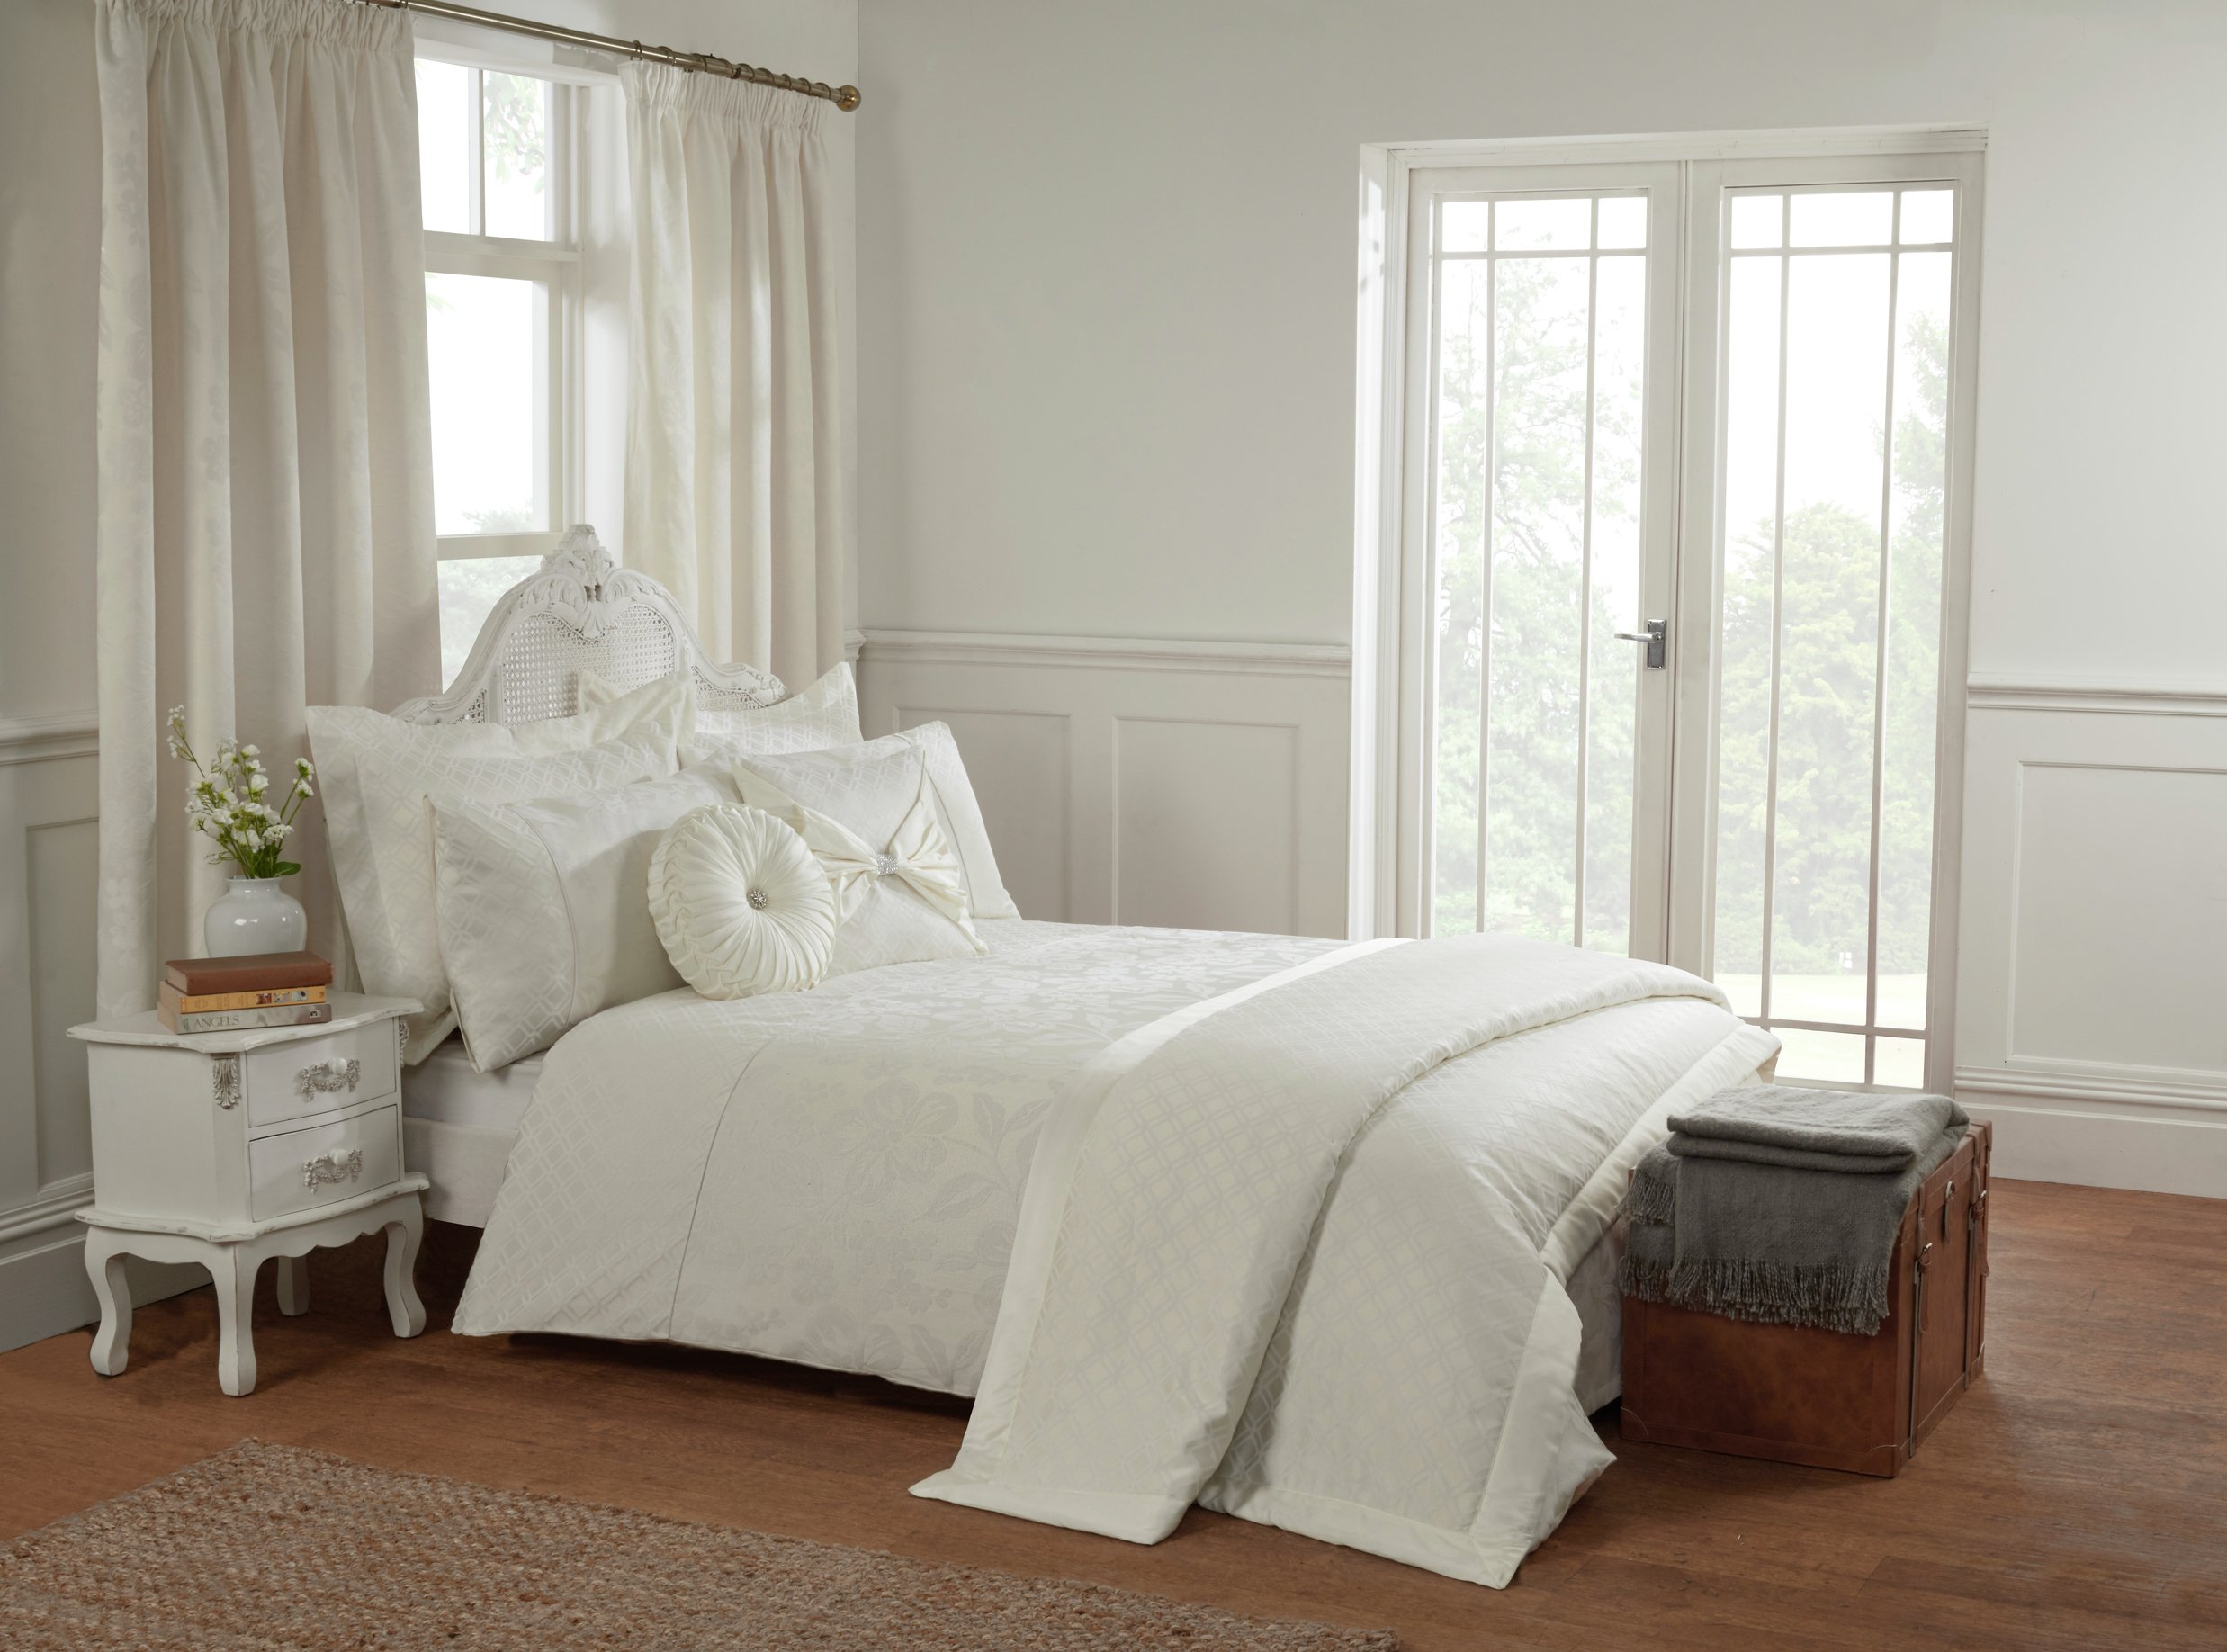 julian charles leona natural bedding set  superking